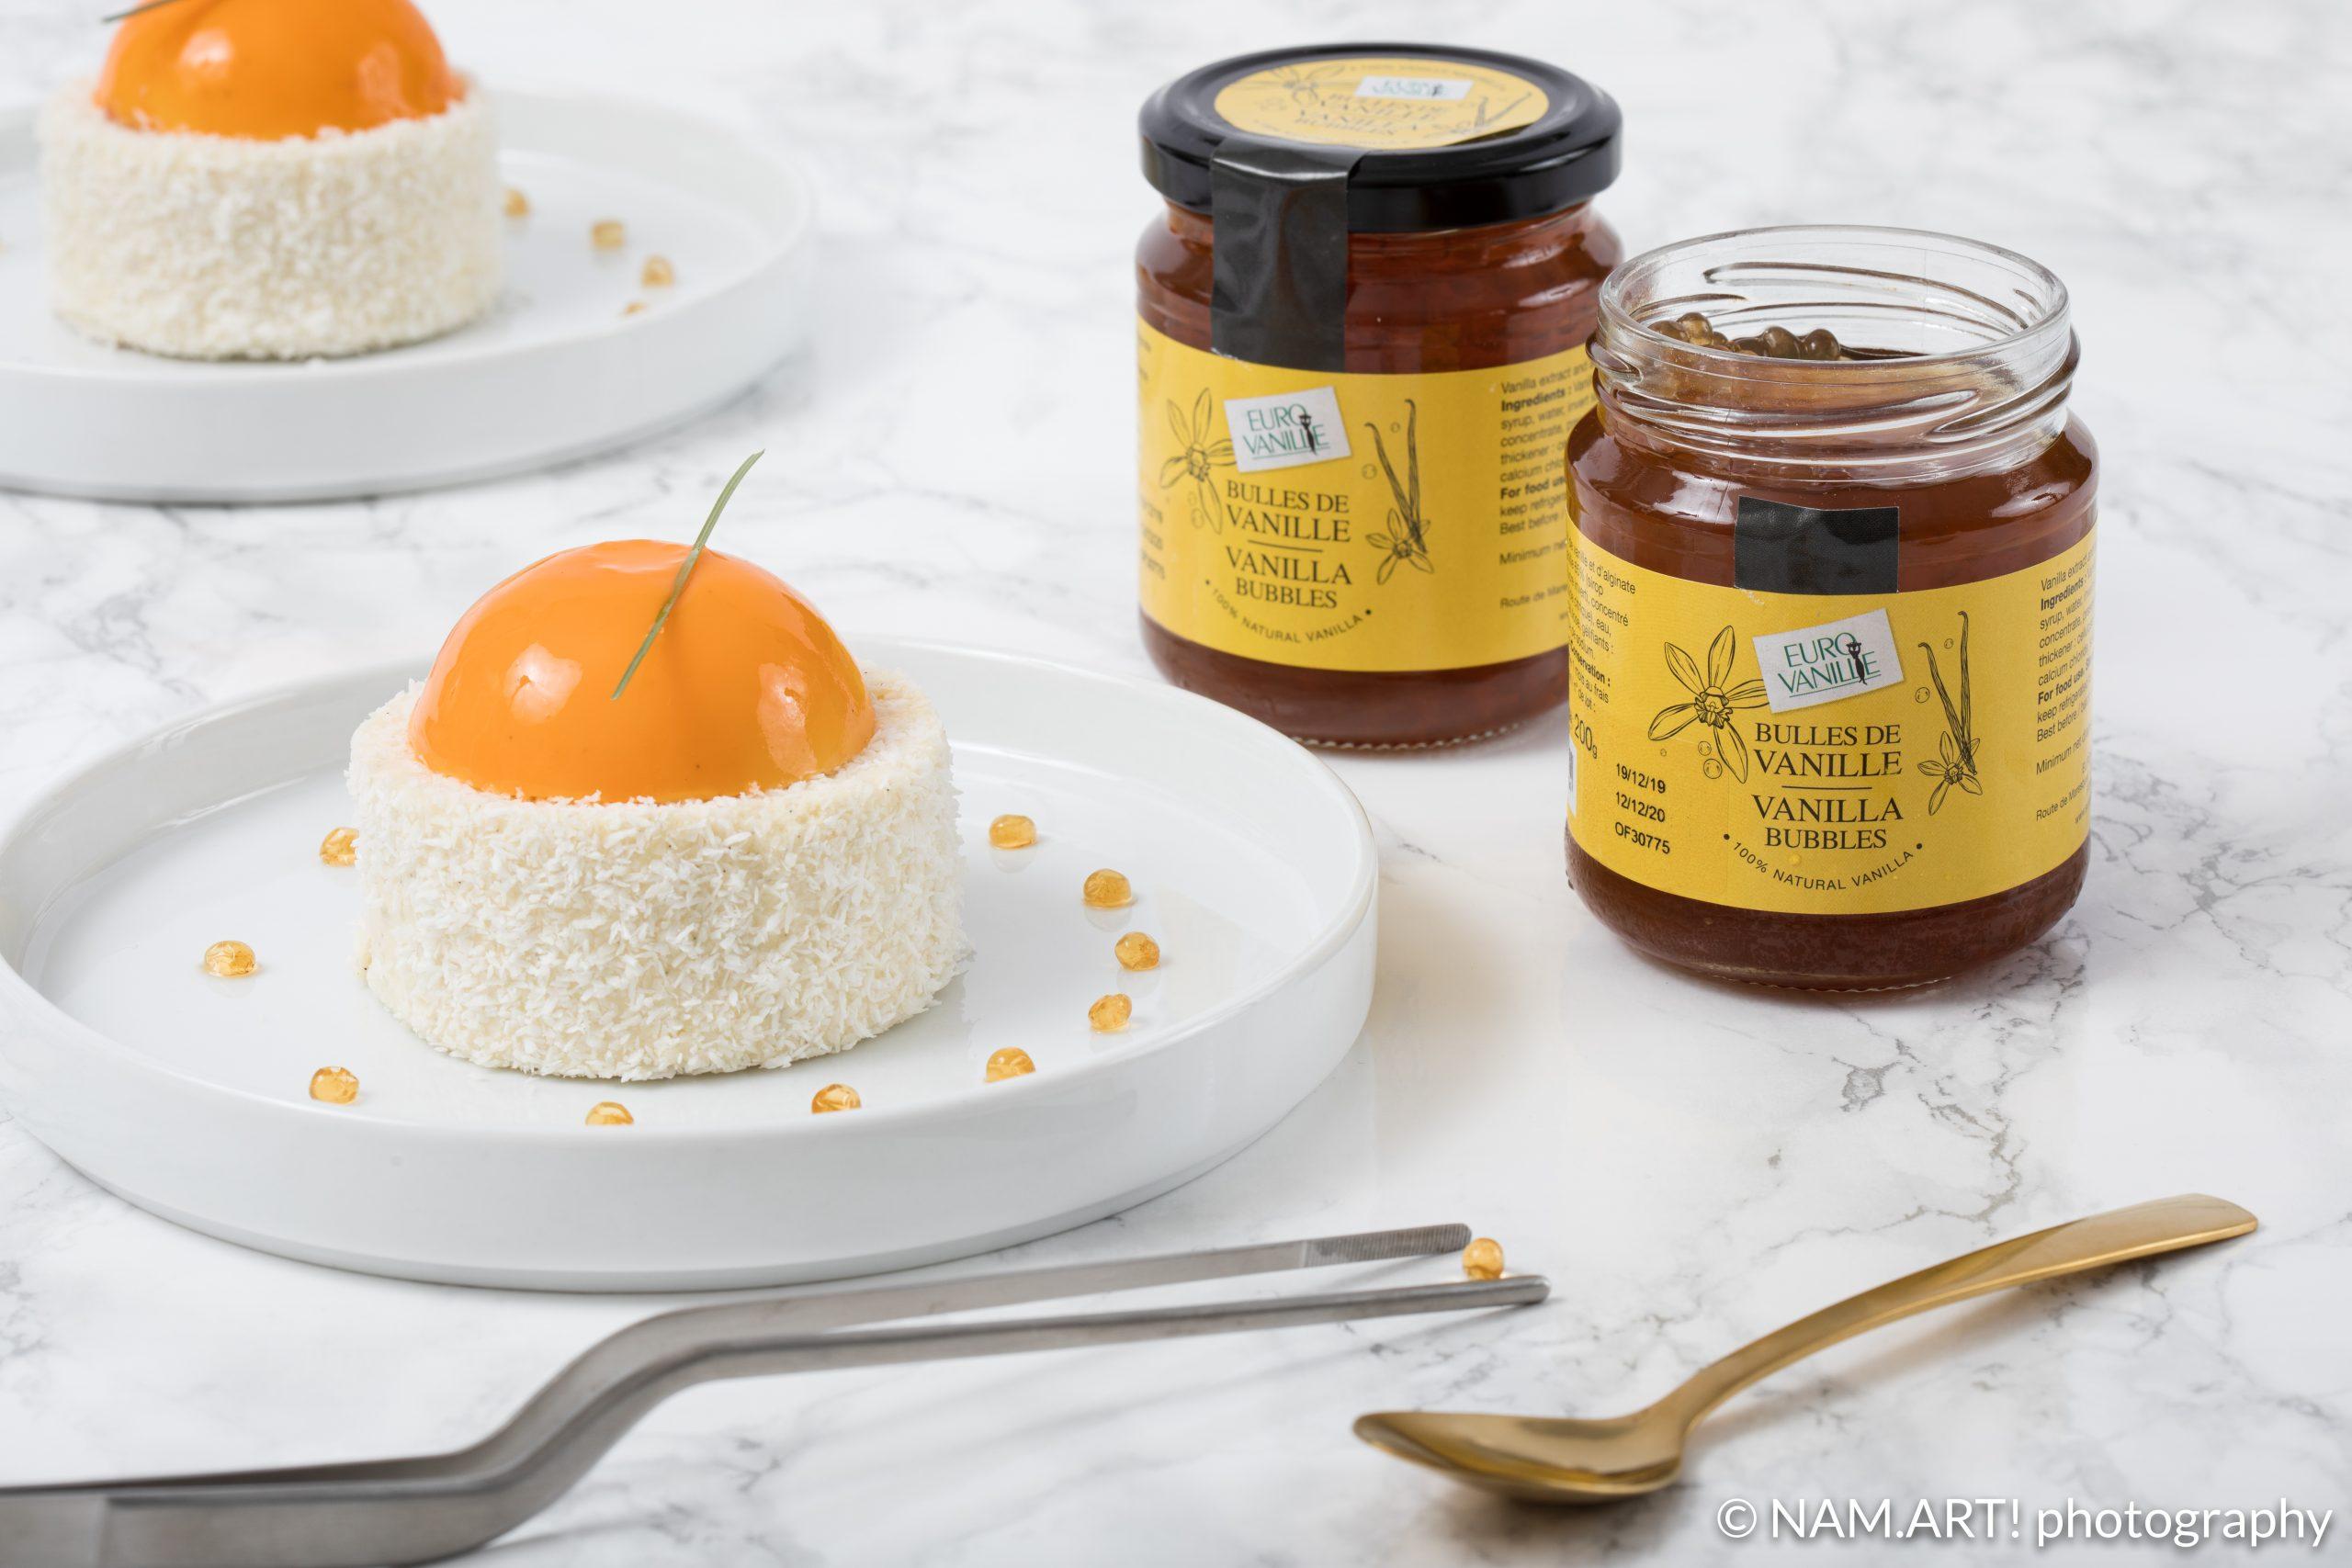 food creativ 2020 ambiance@eurovanille 200 by namartphoto filigranelogo scaled - Découvrez les 7 lauréats finalistes du concours FOOD CREATIV 2020